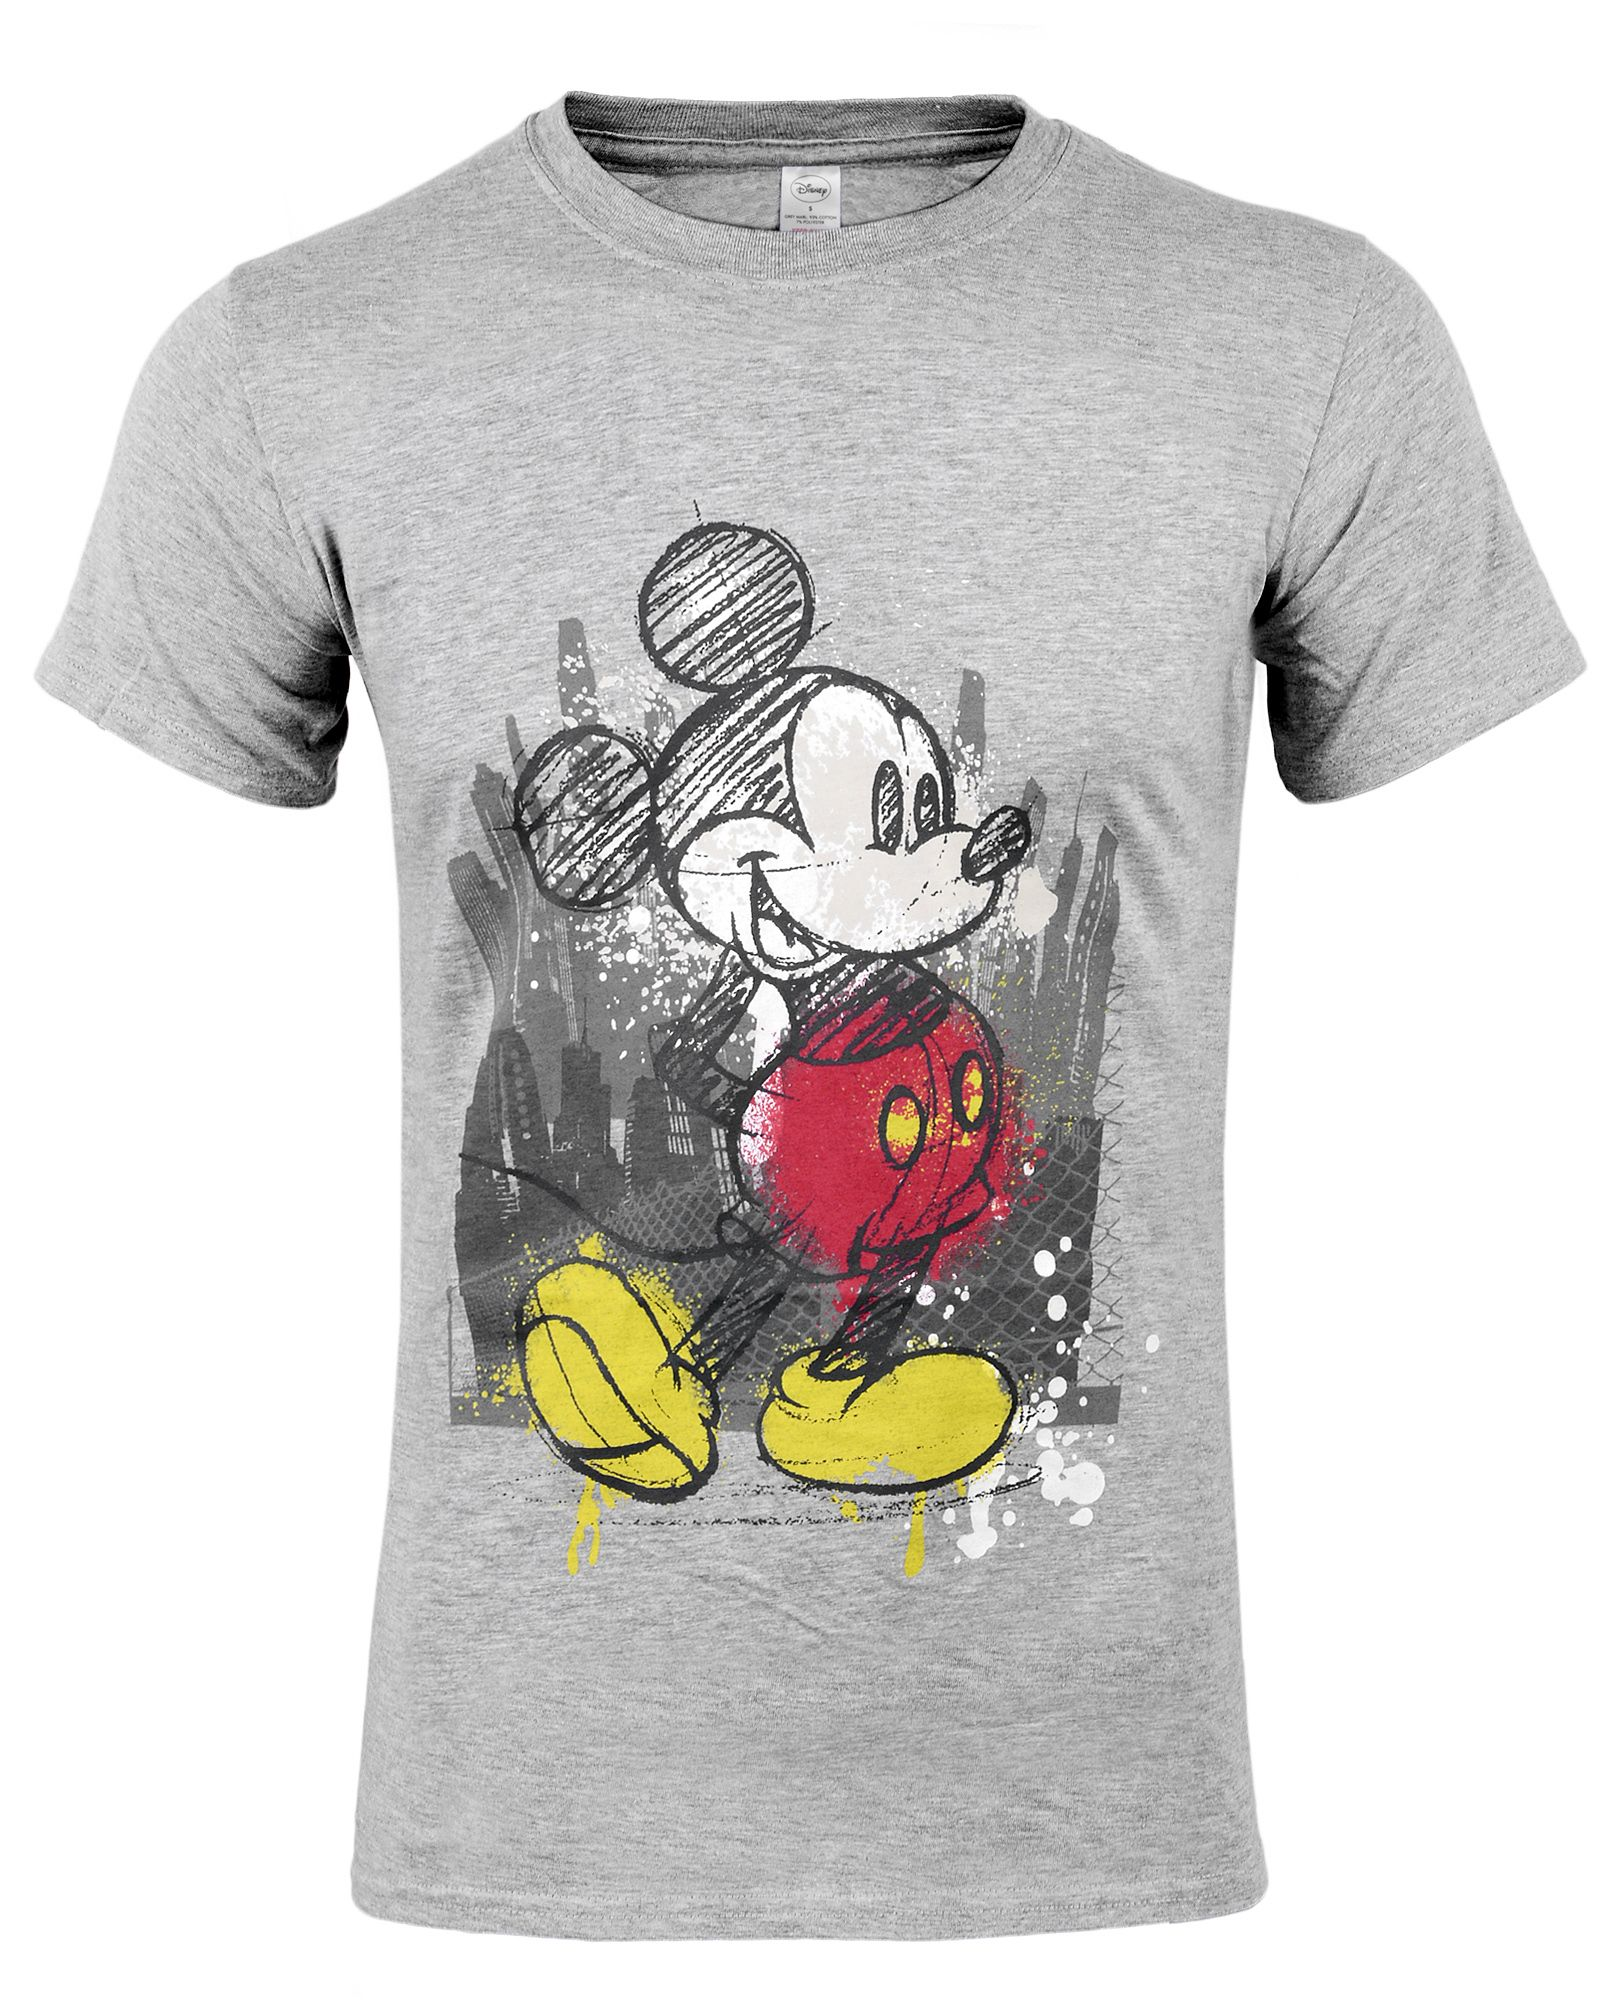 Тениска Micky Mouse - Tap, сива, размер M - 1